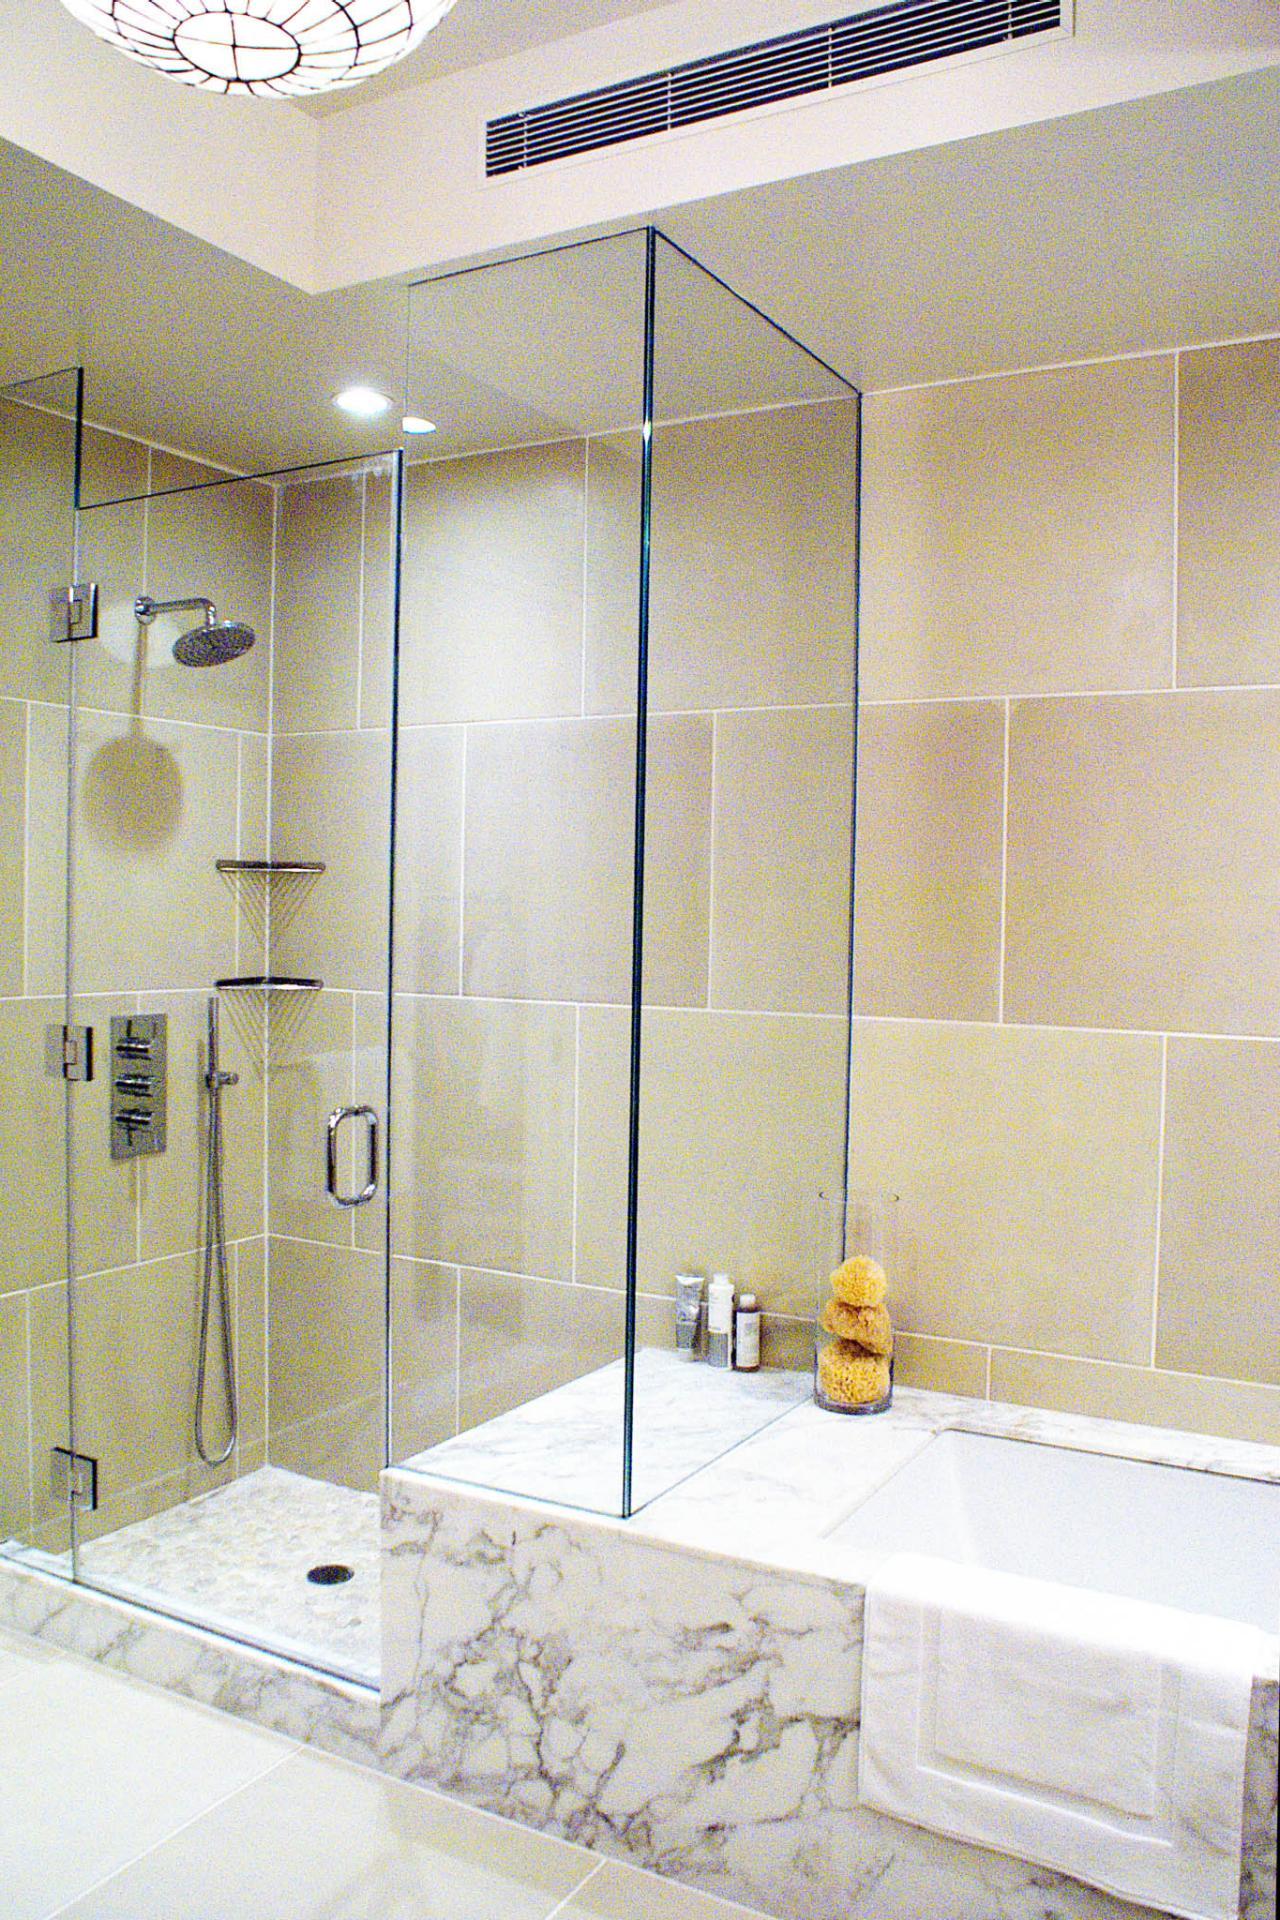 Paul-Cha-Architect_SoHo-Penthouse-Triplex-Loft_Master-Bath.jpg.rend.hgtvcom.1280.1920